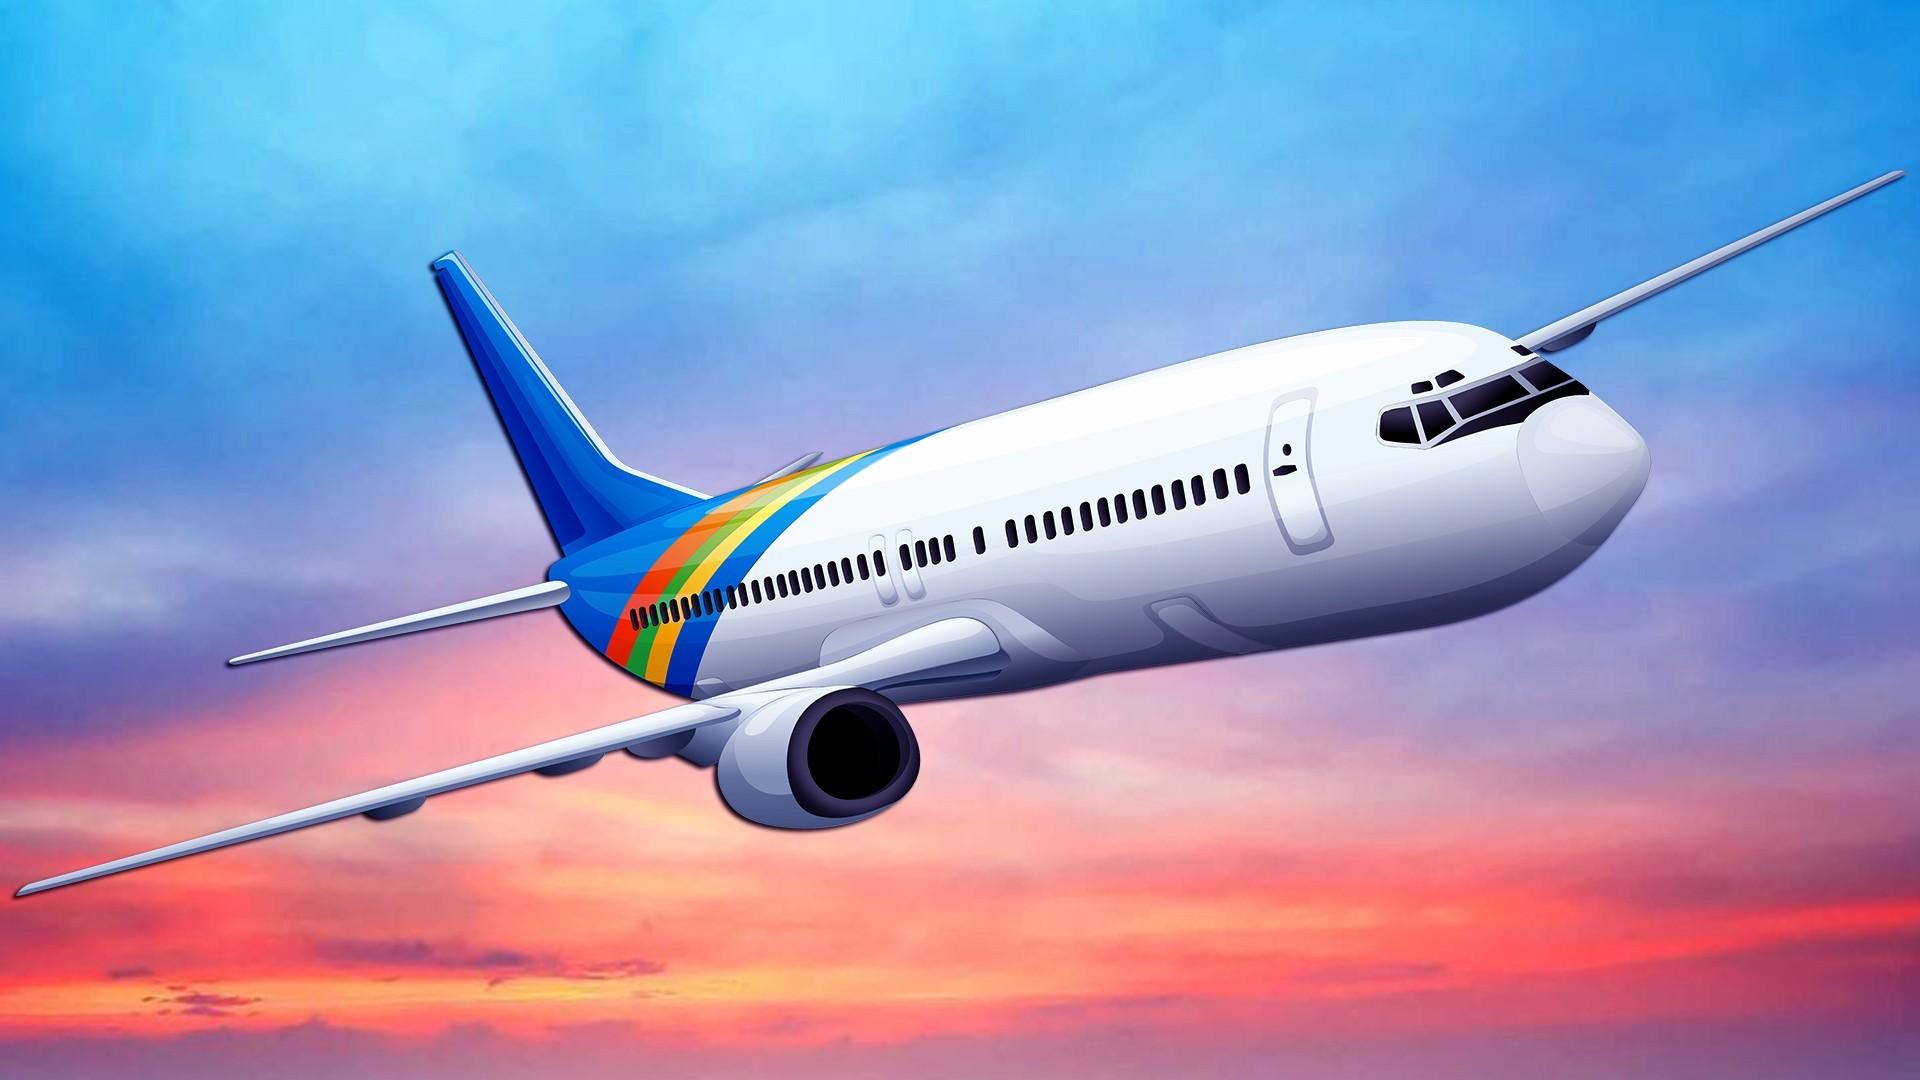 Airplane Desktop Wallpaper   Data Src Airplane Wallpapers - Transparent Background Plane Png - HD Wallpaper